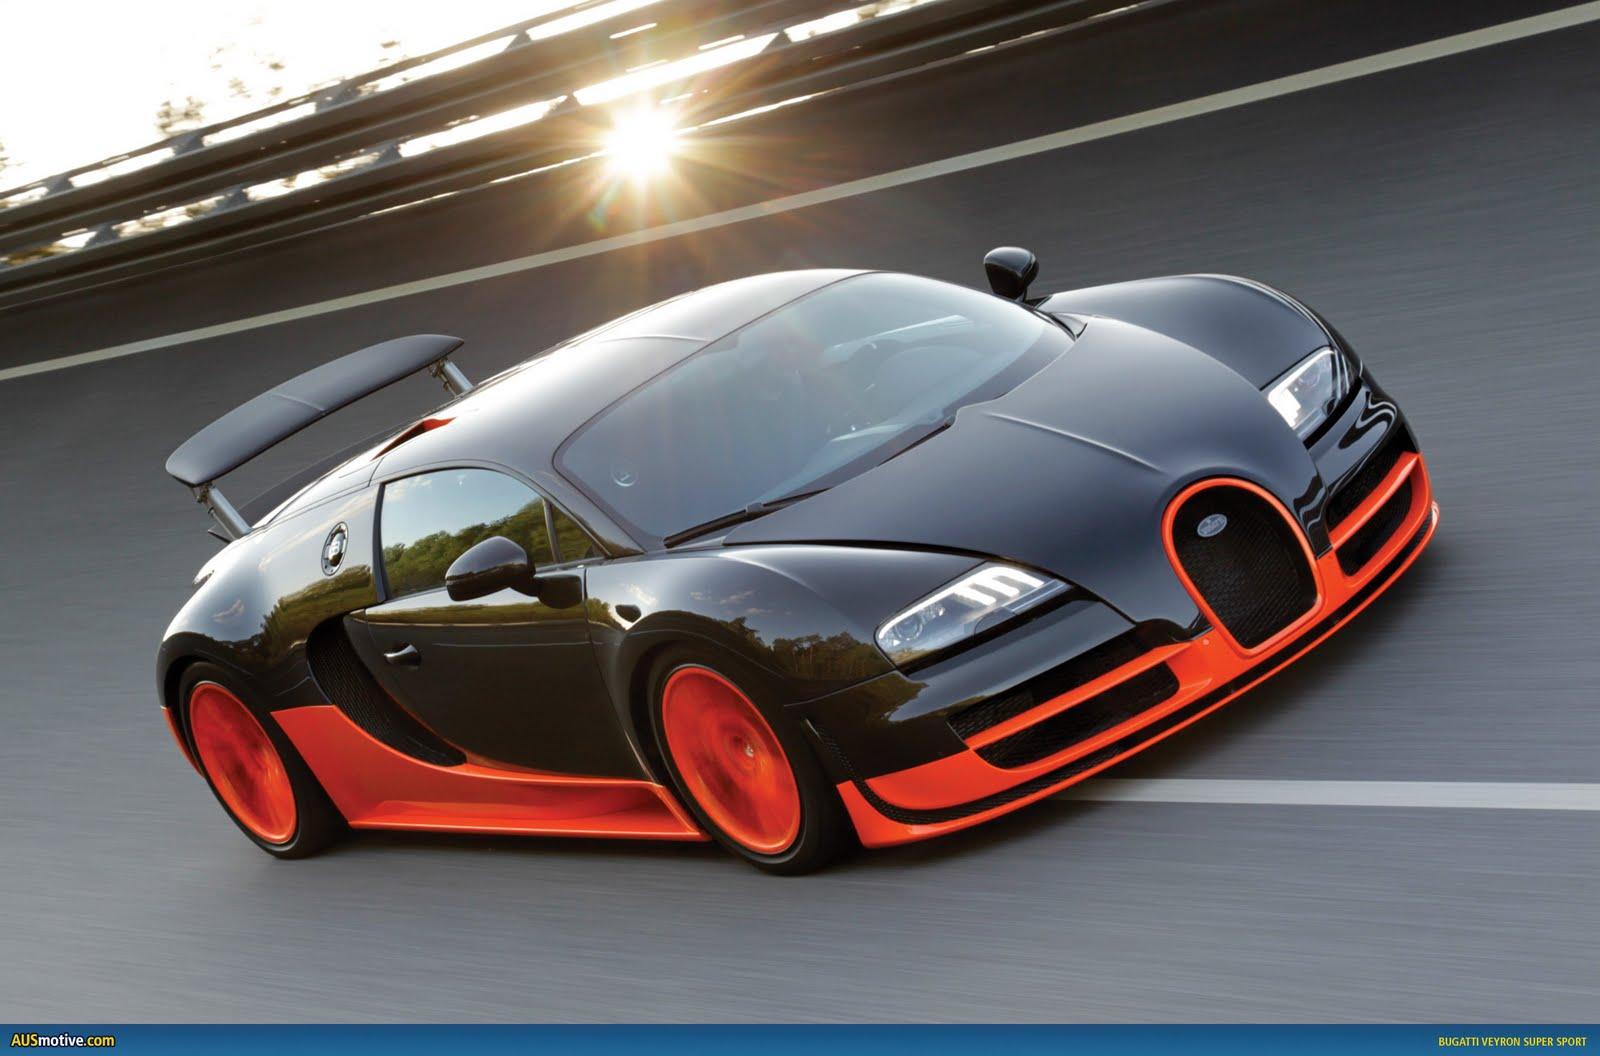 http://1.bp.blogspot.com/-PIWEXGfs-2w/Tfg3sGL0EGI/AAAAAAAABf4/5wB8Lr_DeDk/s1600/Bugatti-Veyron-Super-Sport-01.jpg